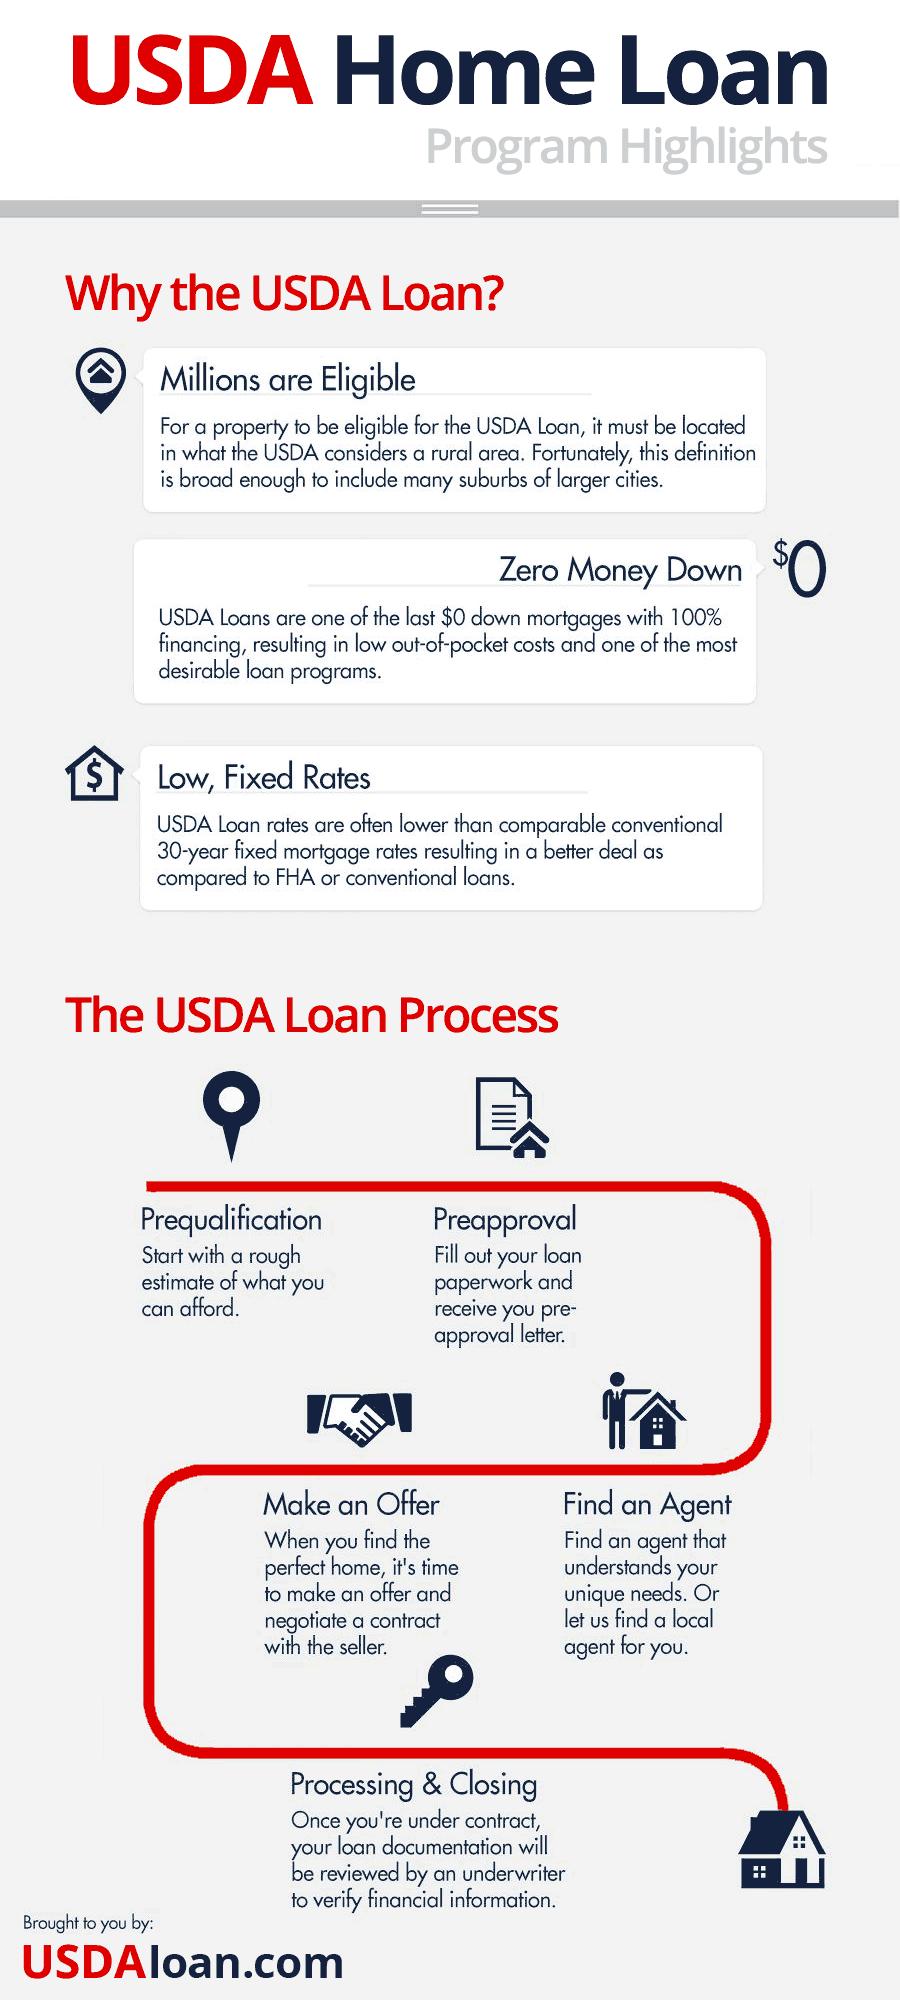 Usda Loans In California | Usda Home Loan California - Usda Home Loan Map California